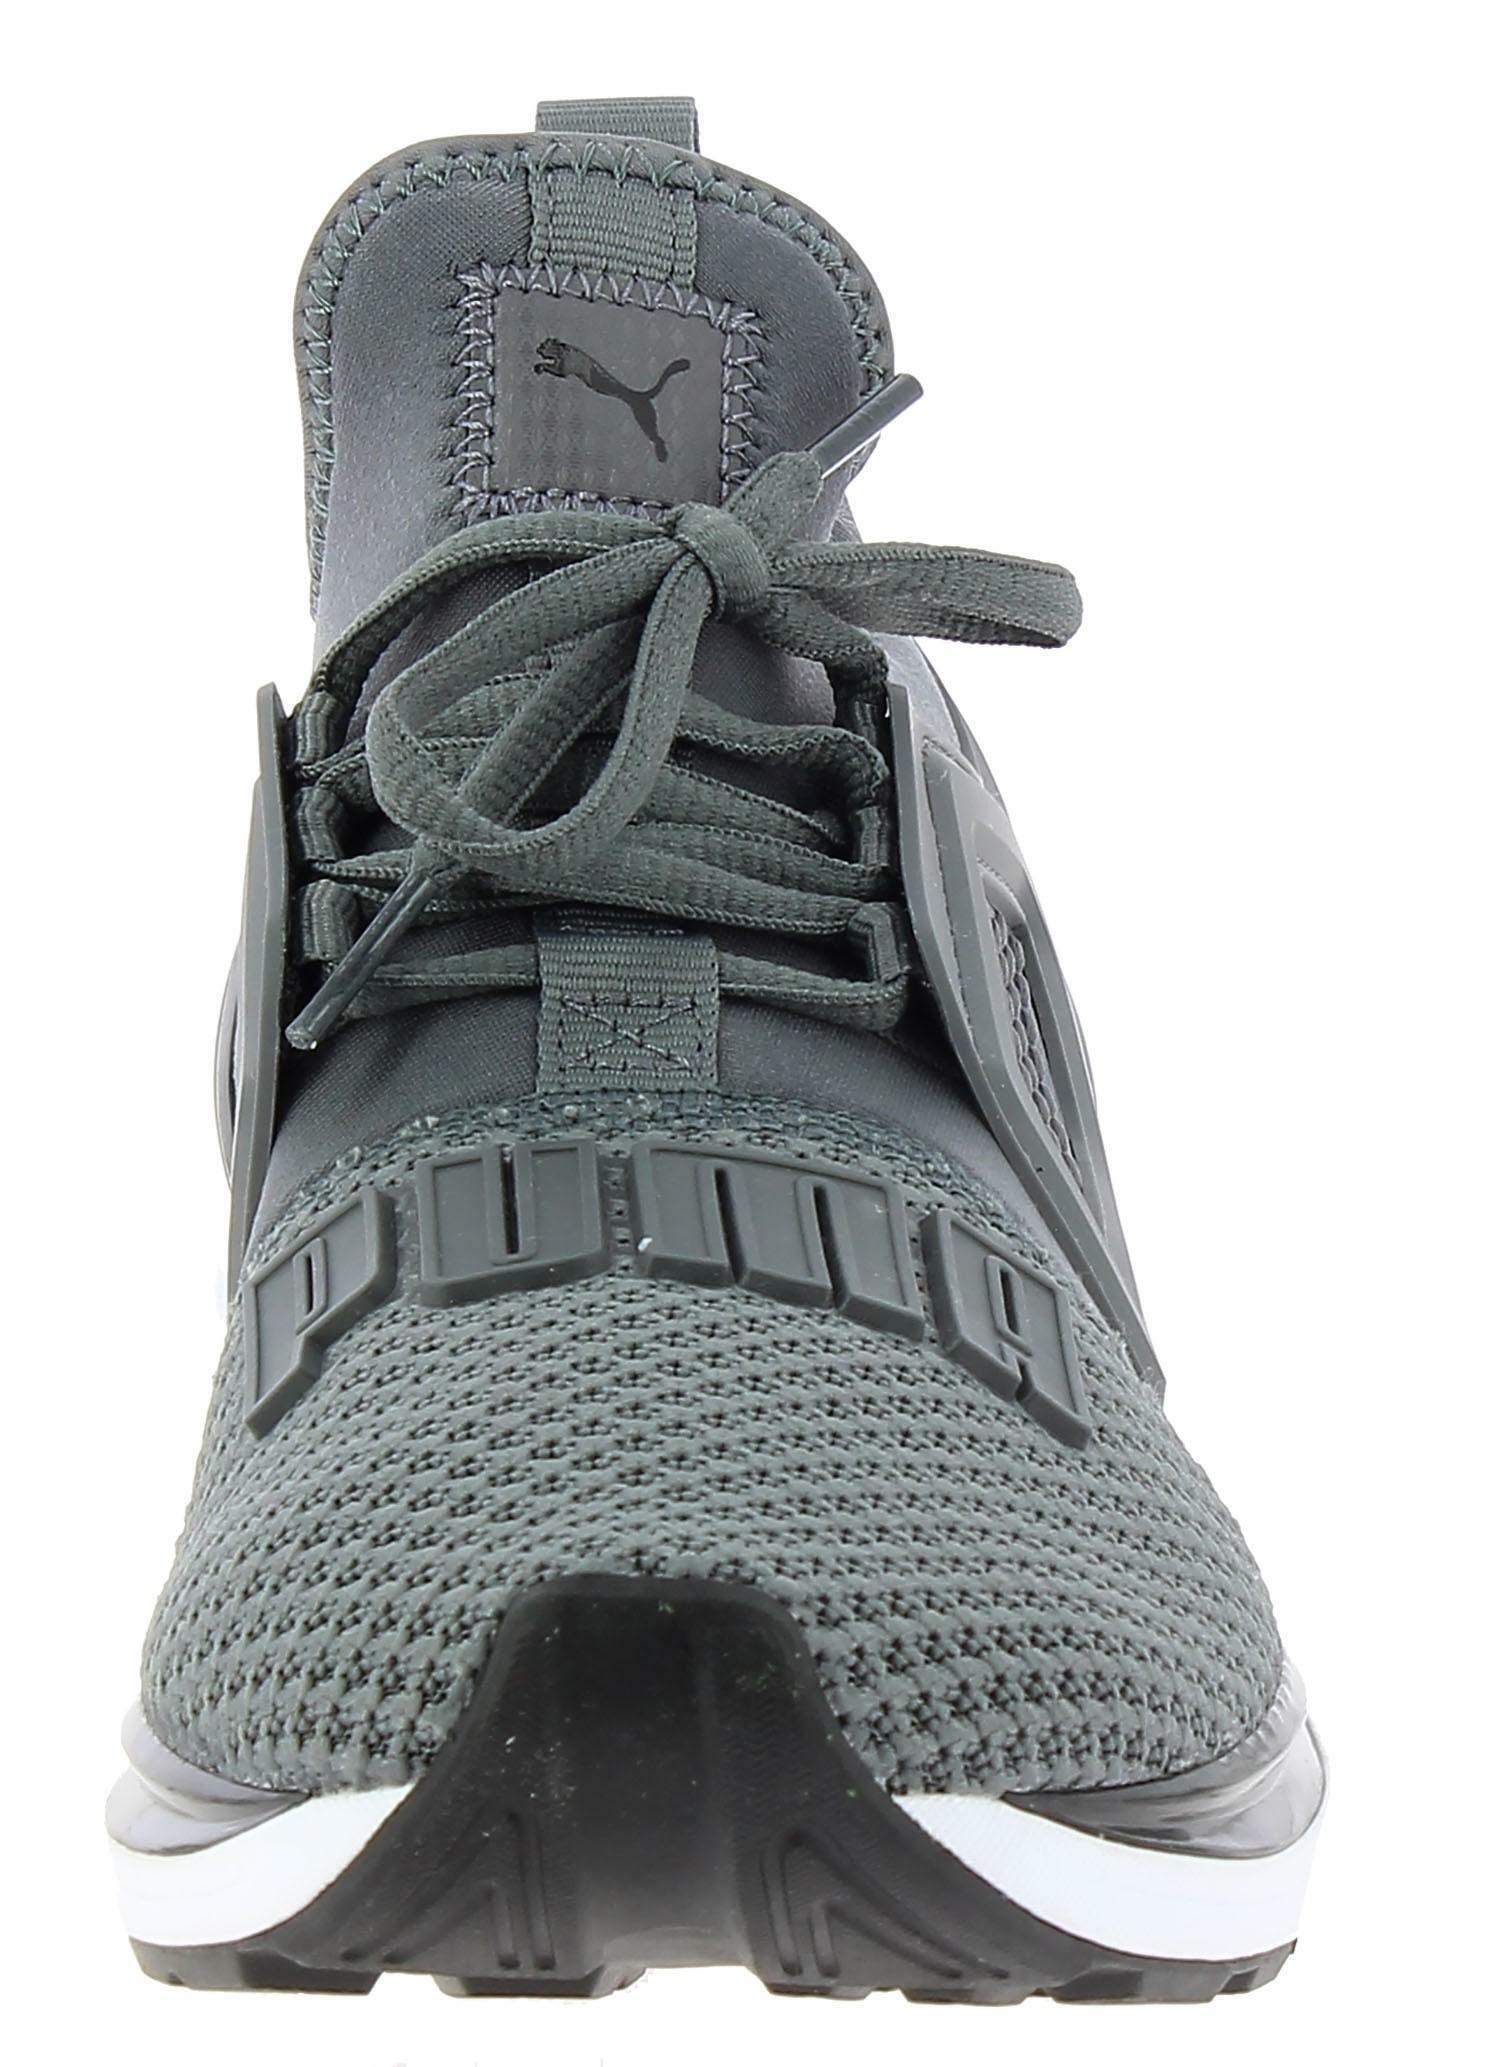 puma puma ignite limitless weave scarpe sportive uomo grigie 19129303